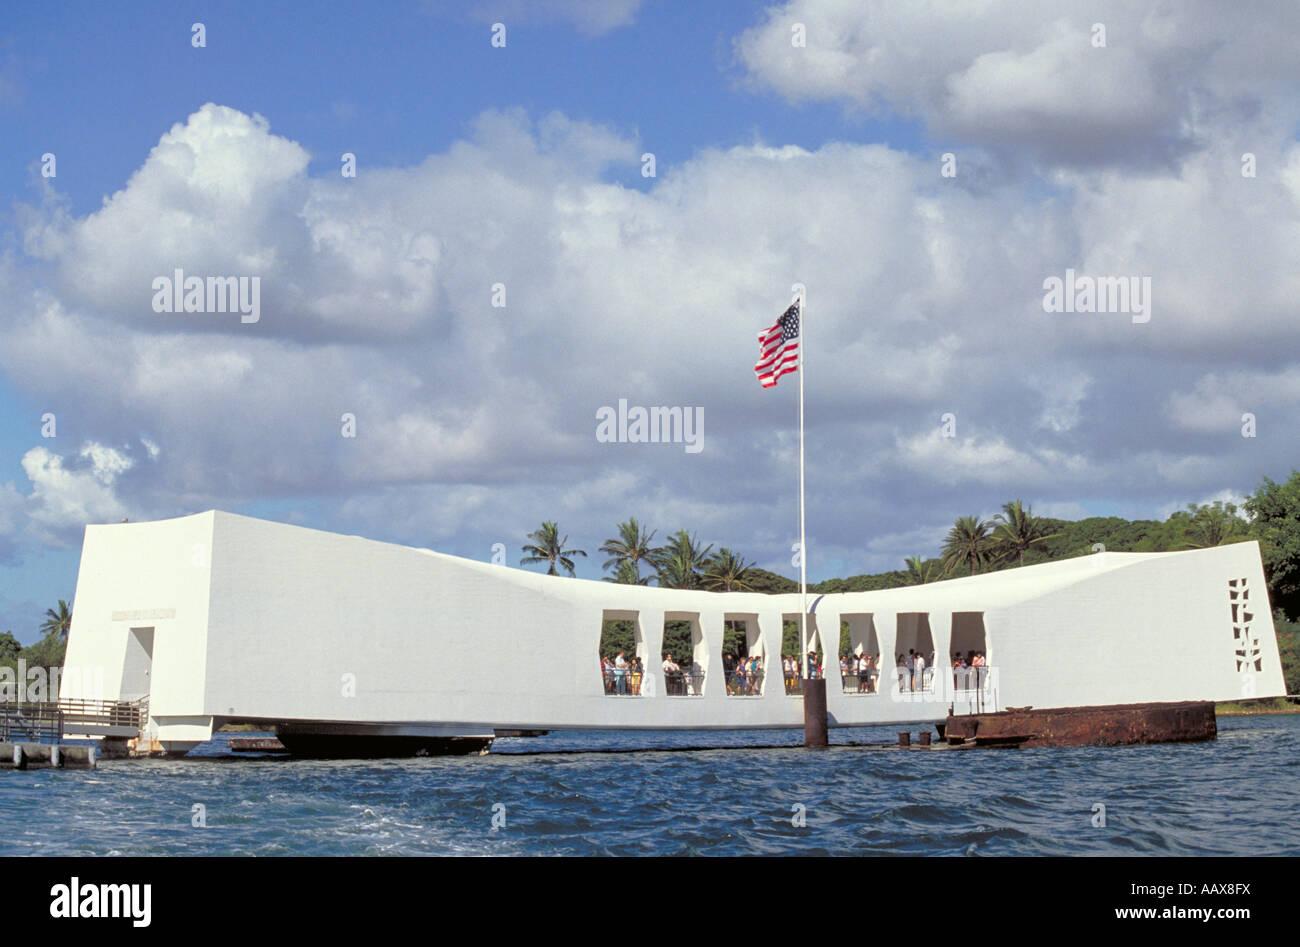 Elk214 1744 Hawaii Oahu Pearl Harbor USS Arizona Memorial Stock Photo